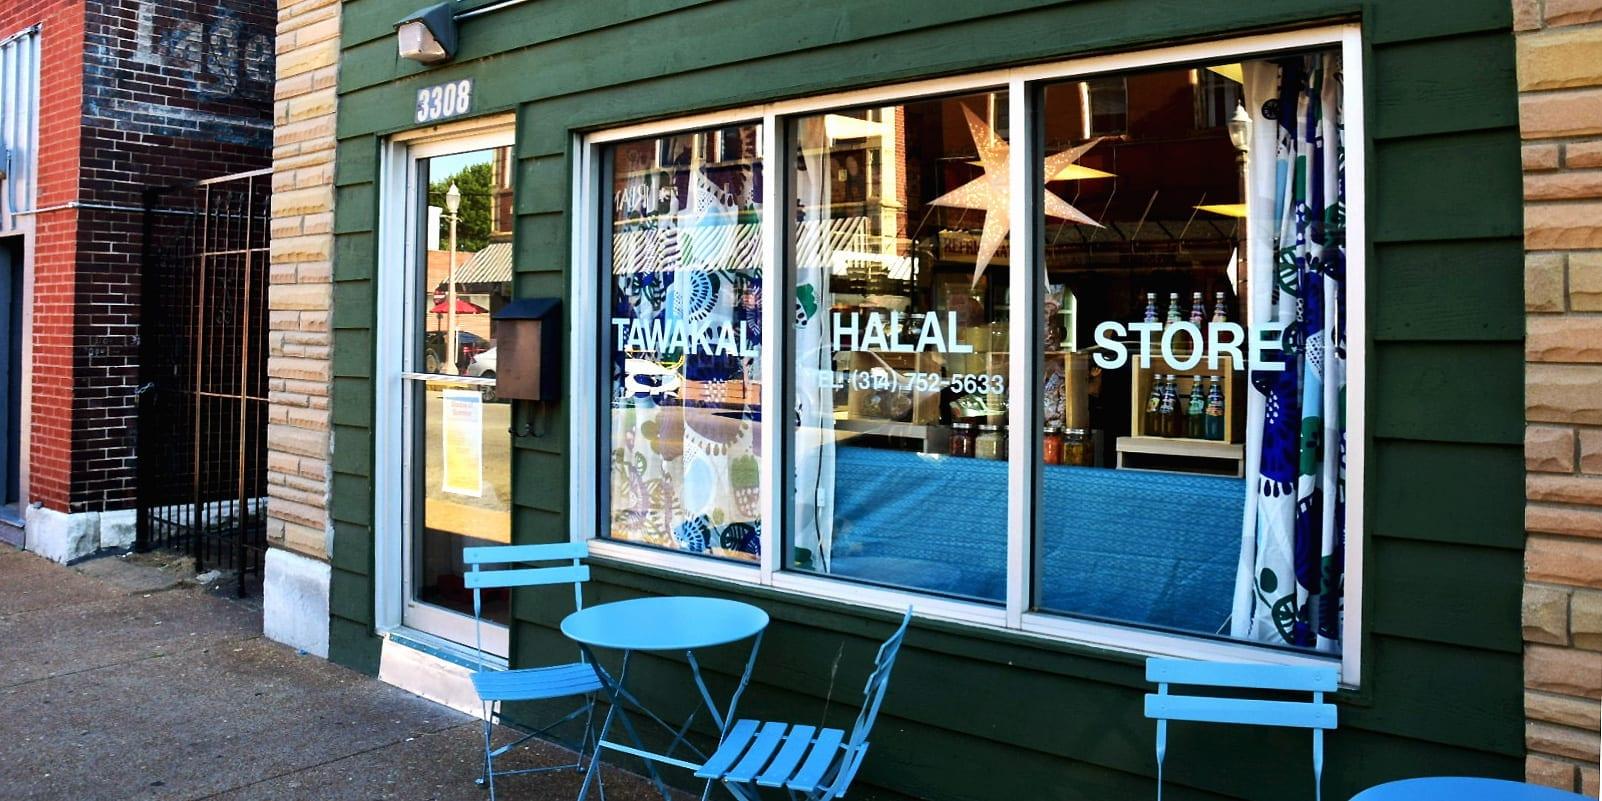 New sidewalk furniture in front of the Tawakal Halal Store on Meramec Street in Downtown Dutchtown.